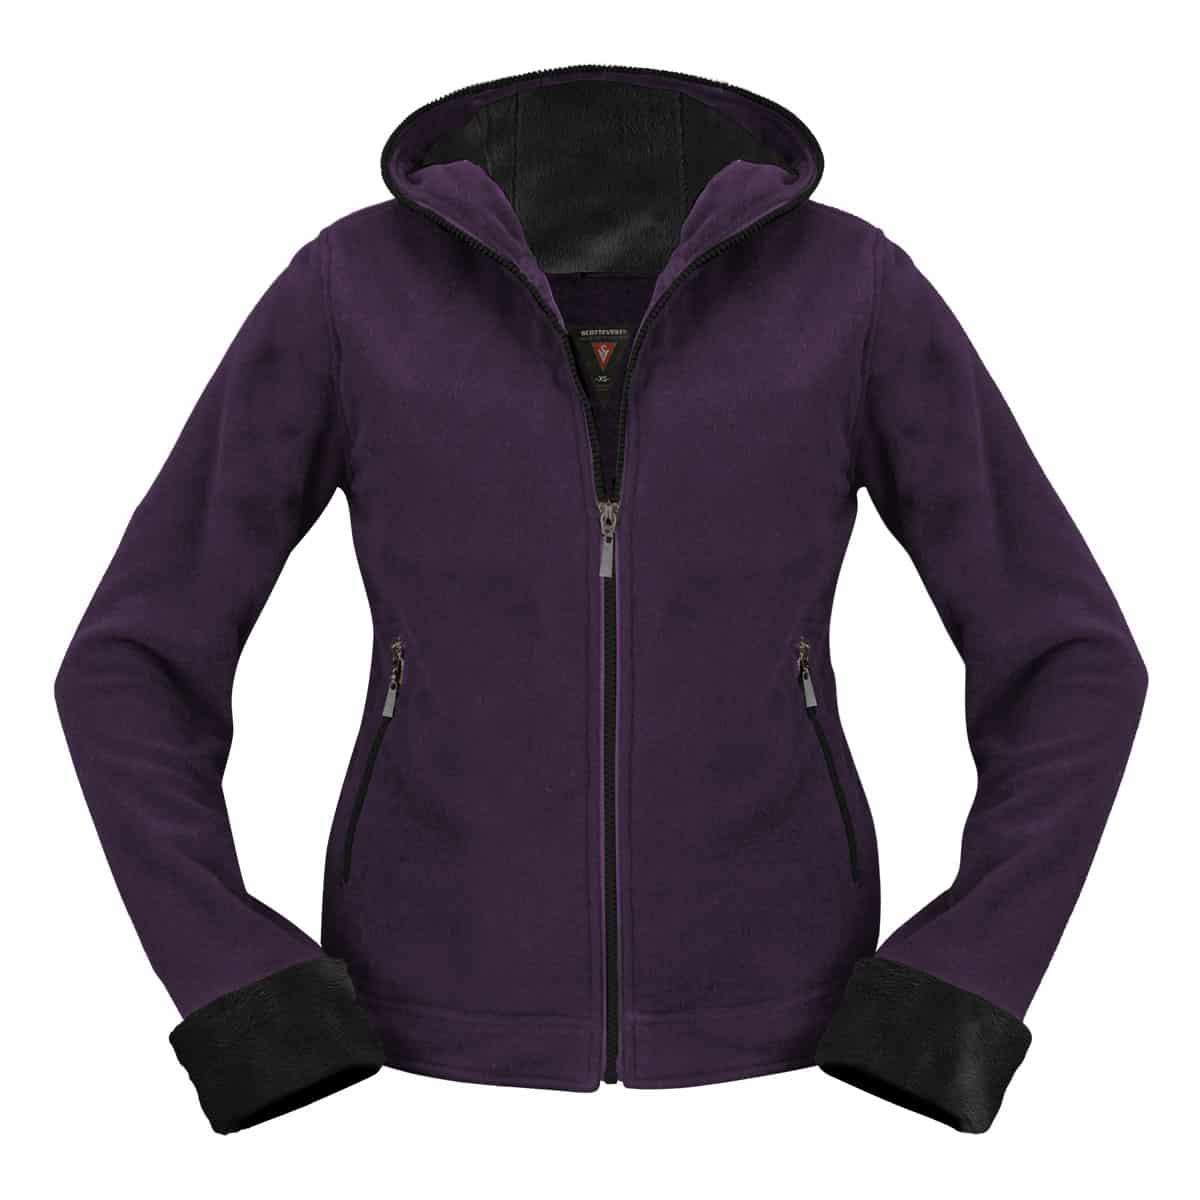 best travel fleece jacket scottevest chloe hoodie review On travel fleece jacket